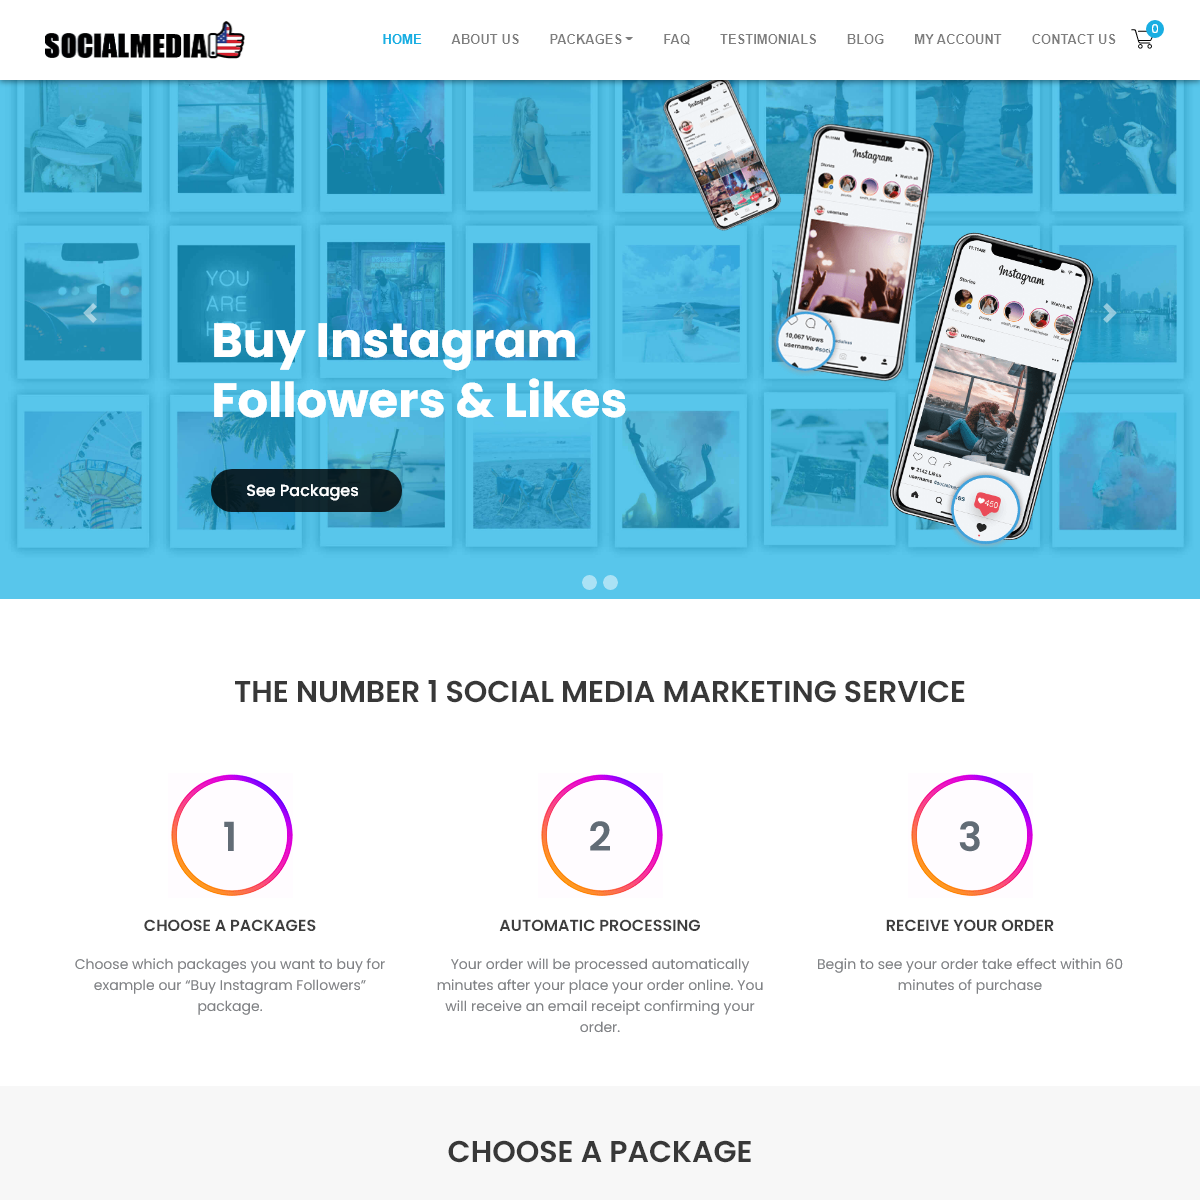 Social Media Likes USA - Buy Instagram Followers, Likes & Views